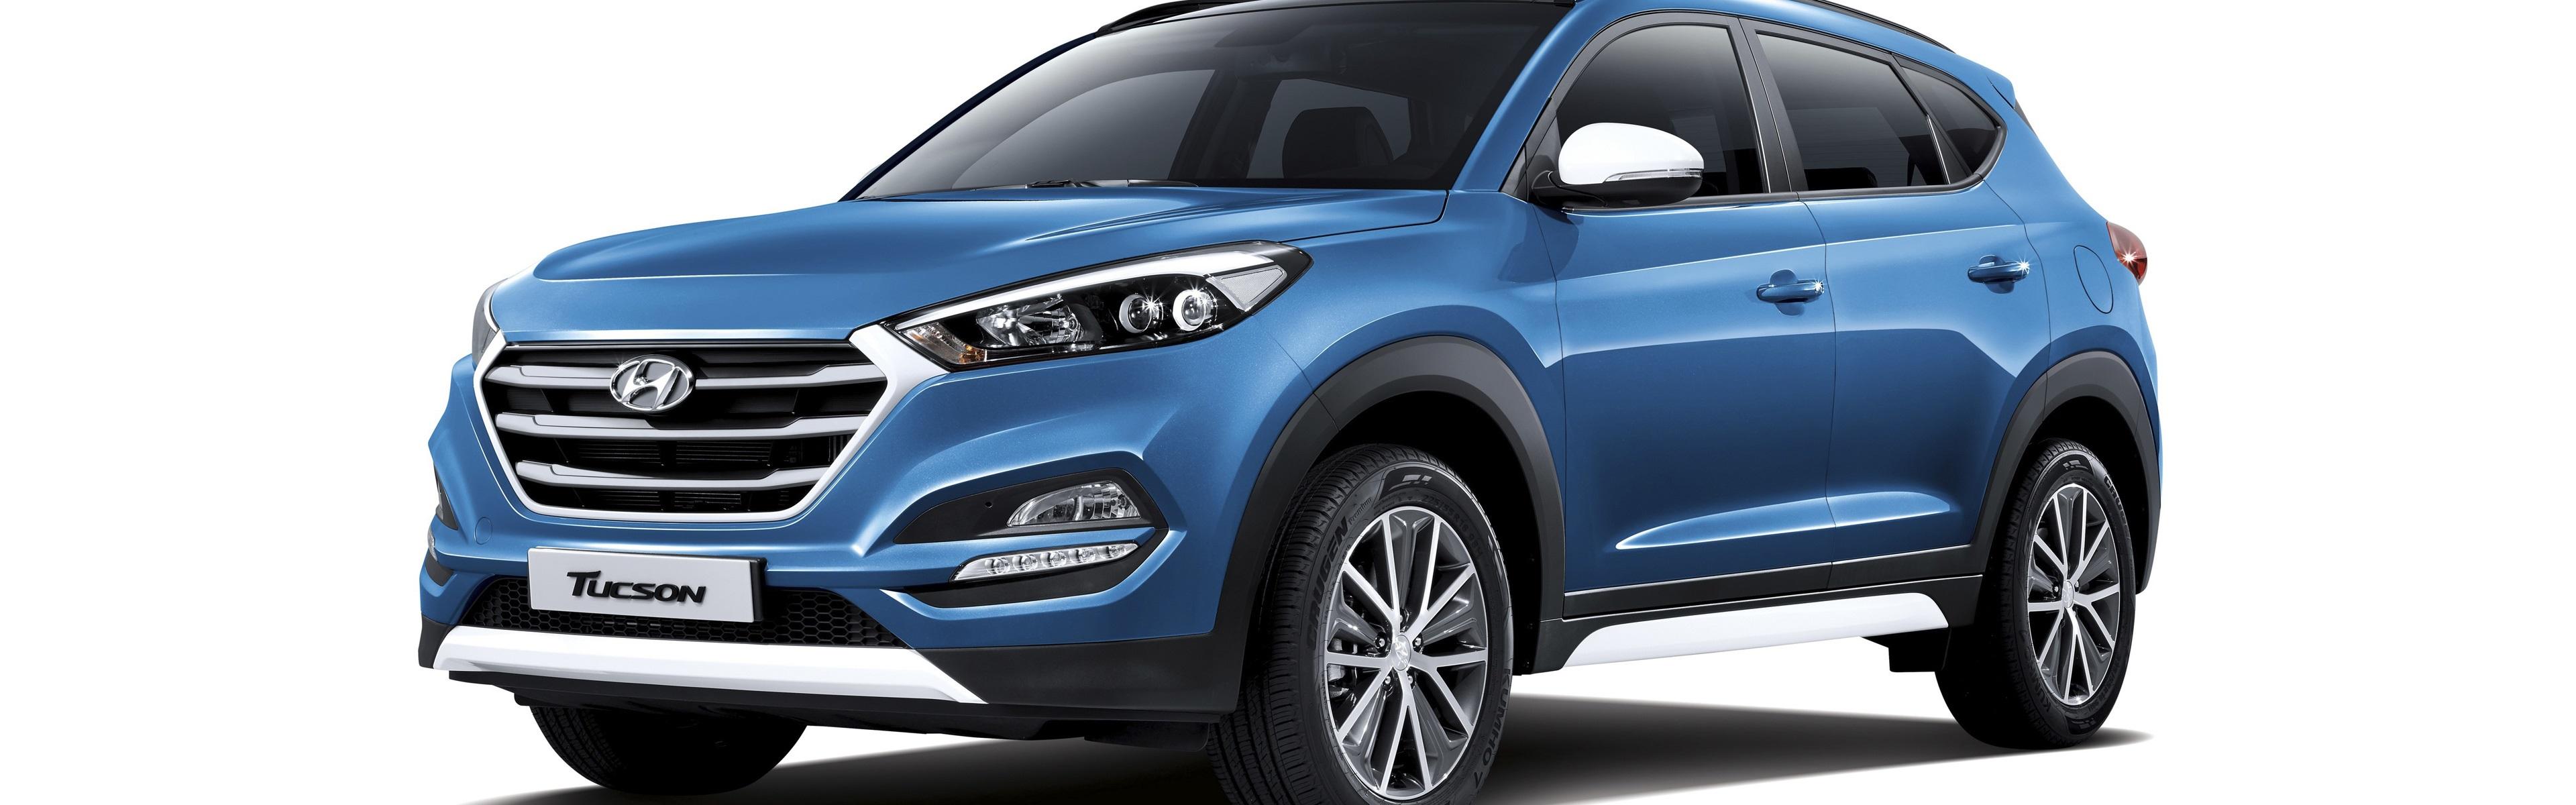 Hyundai Elantra Coupe >> Wallpaper Hyundai Tucson blue SUV car 3840x2160 UHD 4K Picture, Image